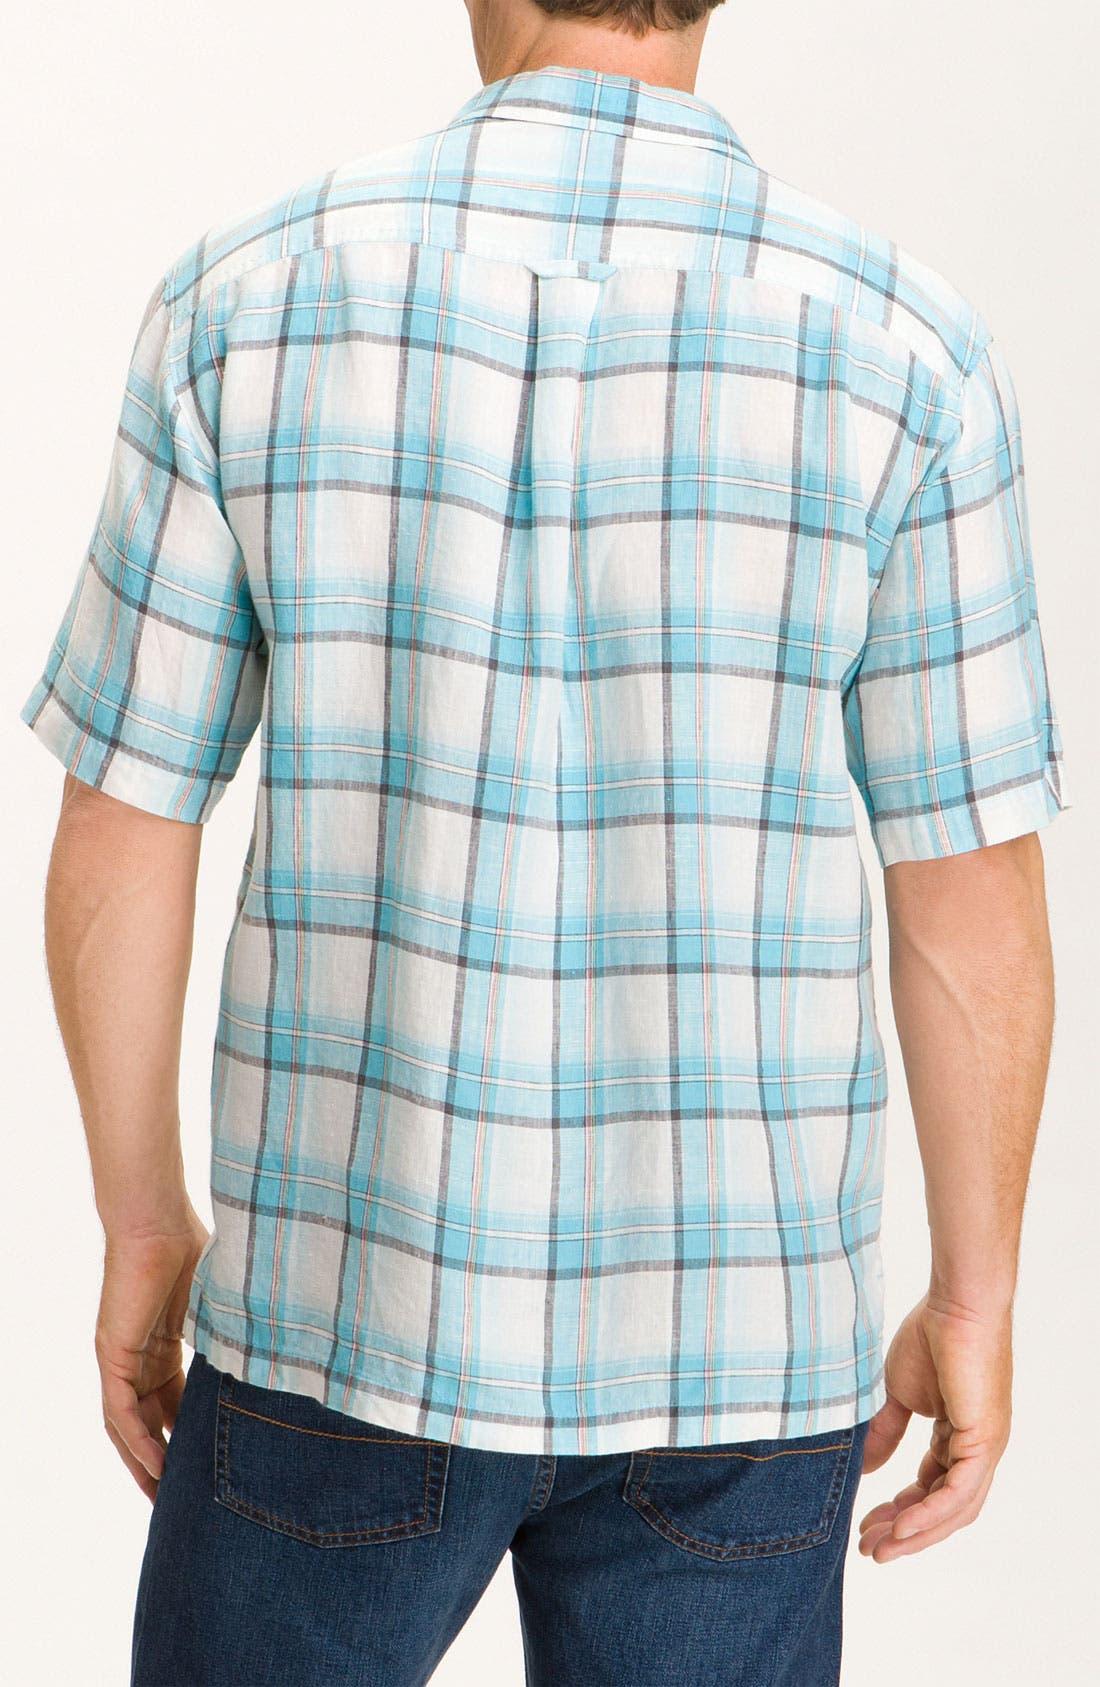 Alternate Image 2  - Tommy Bahama 'Plaid City Limits' Sport Shirt